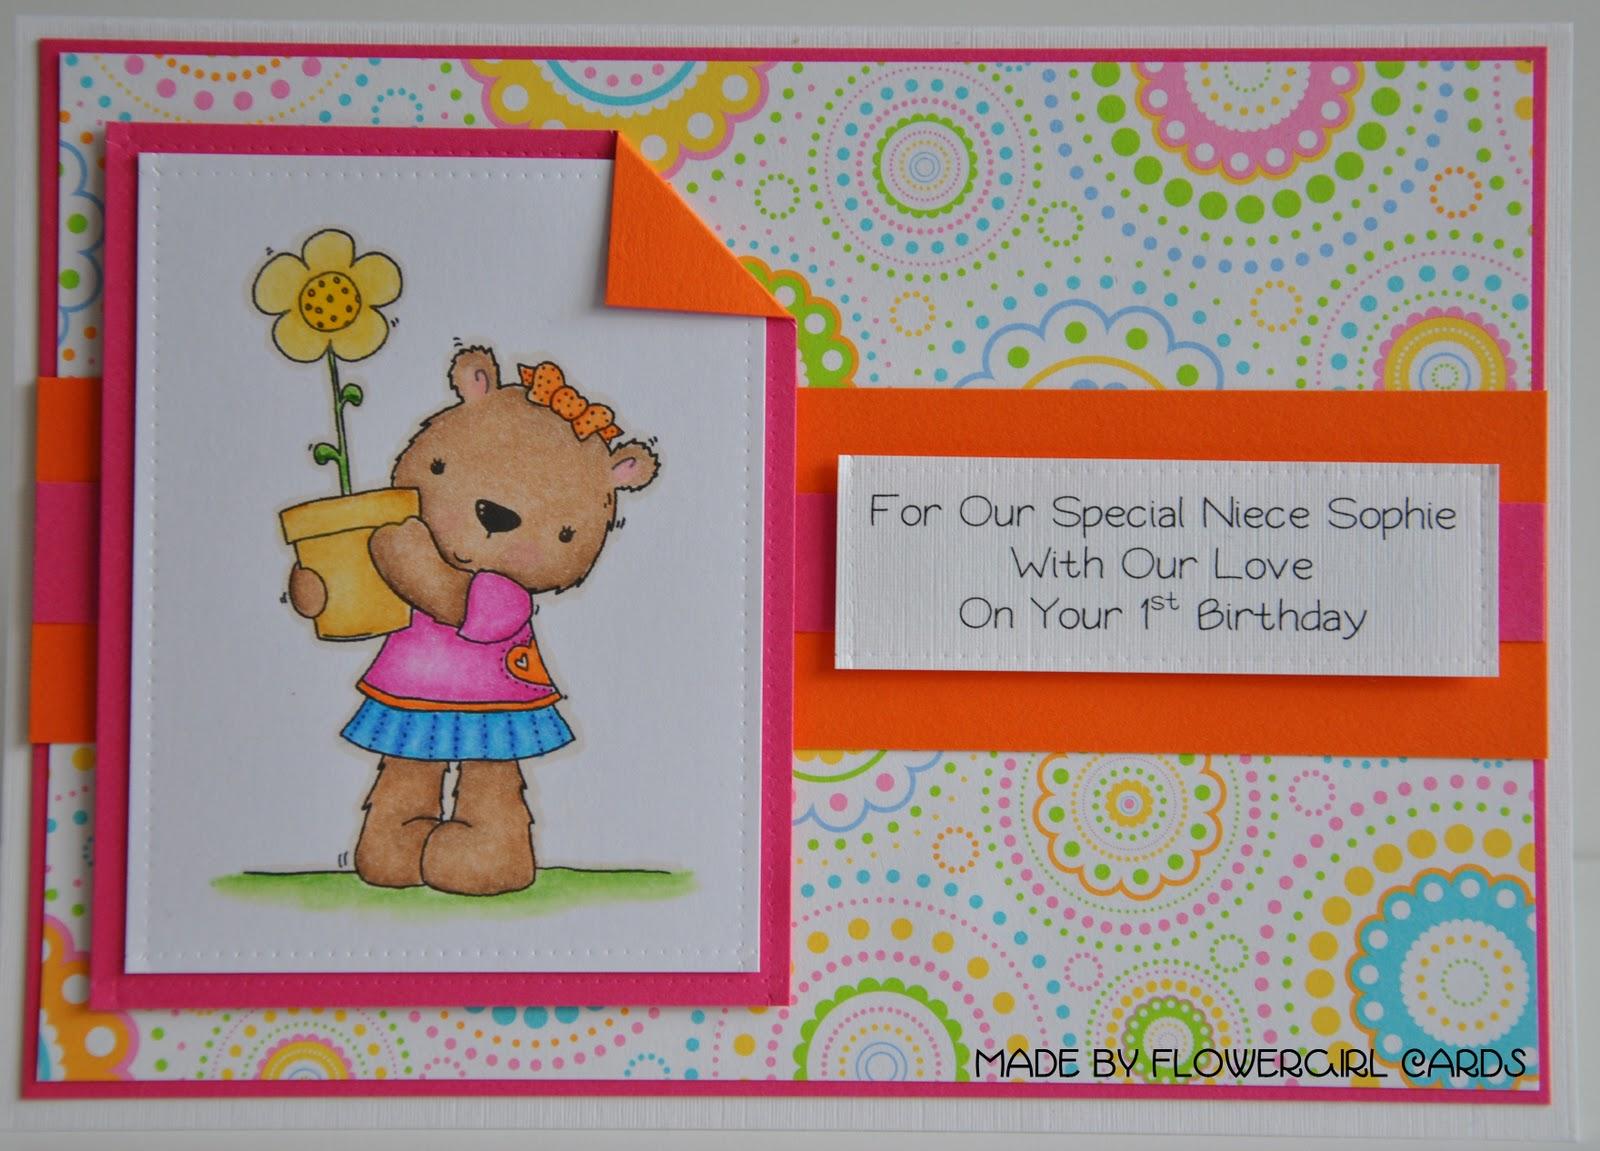 flowergirl cards 1st birthday card